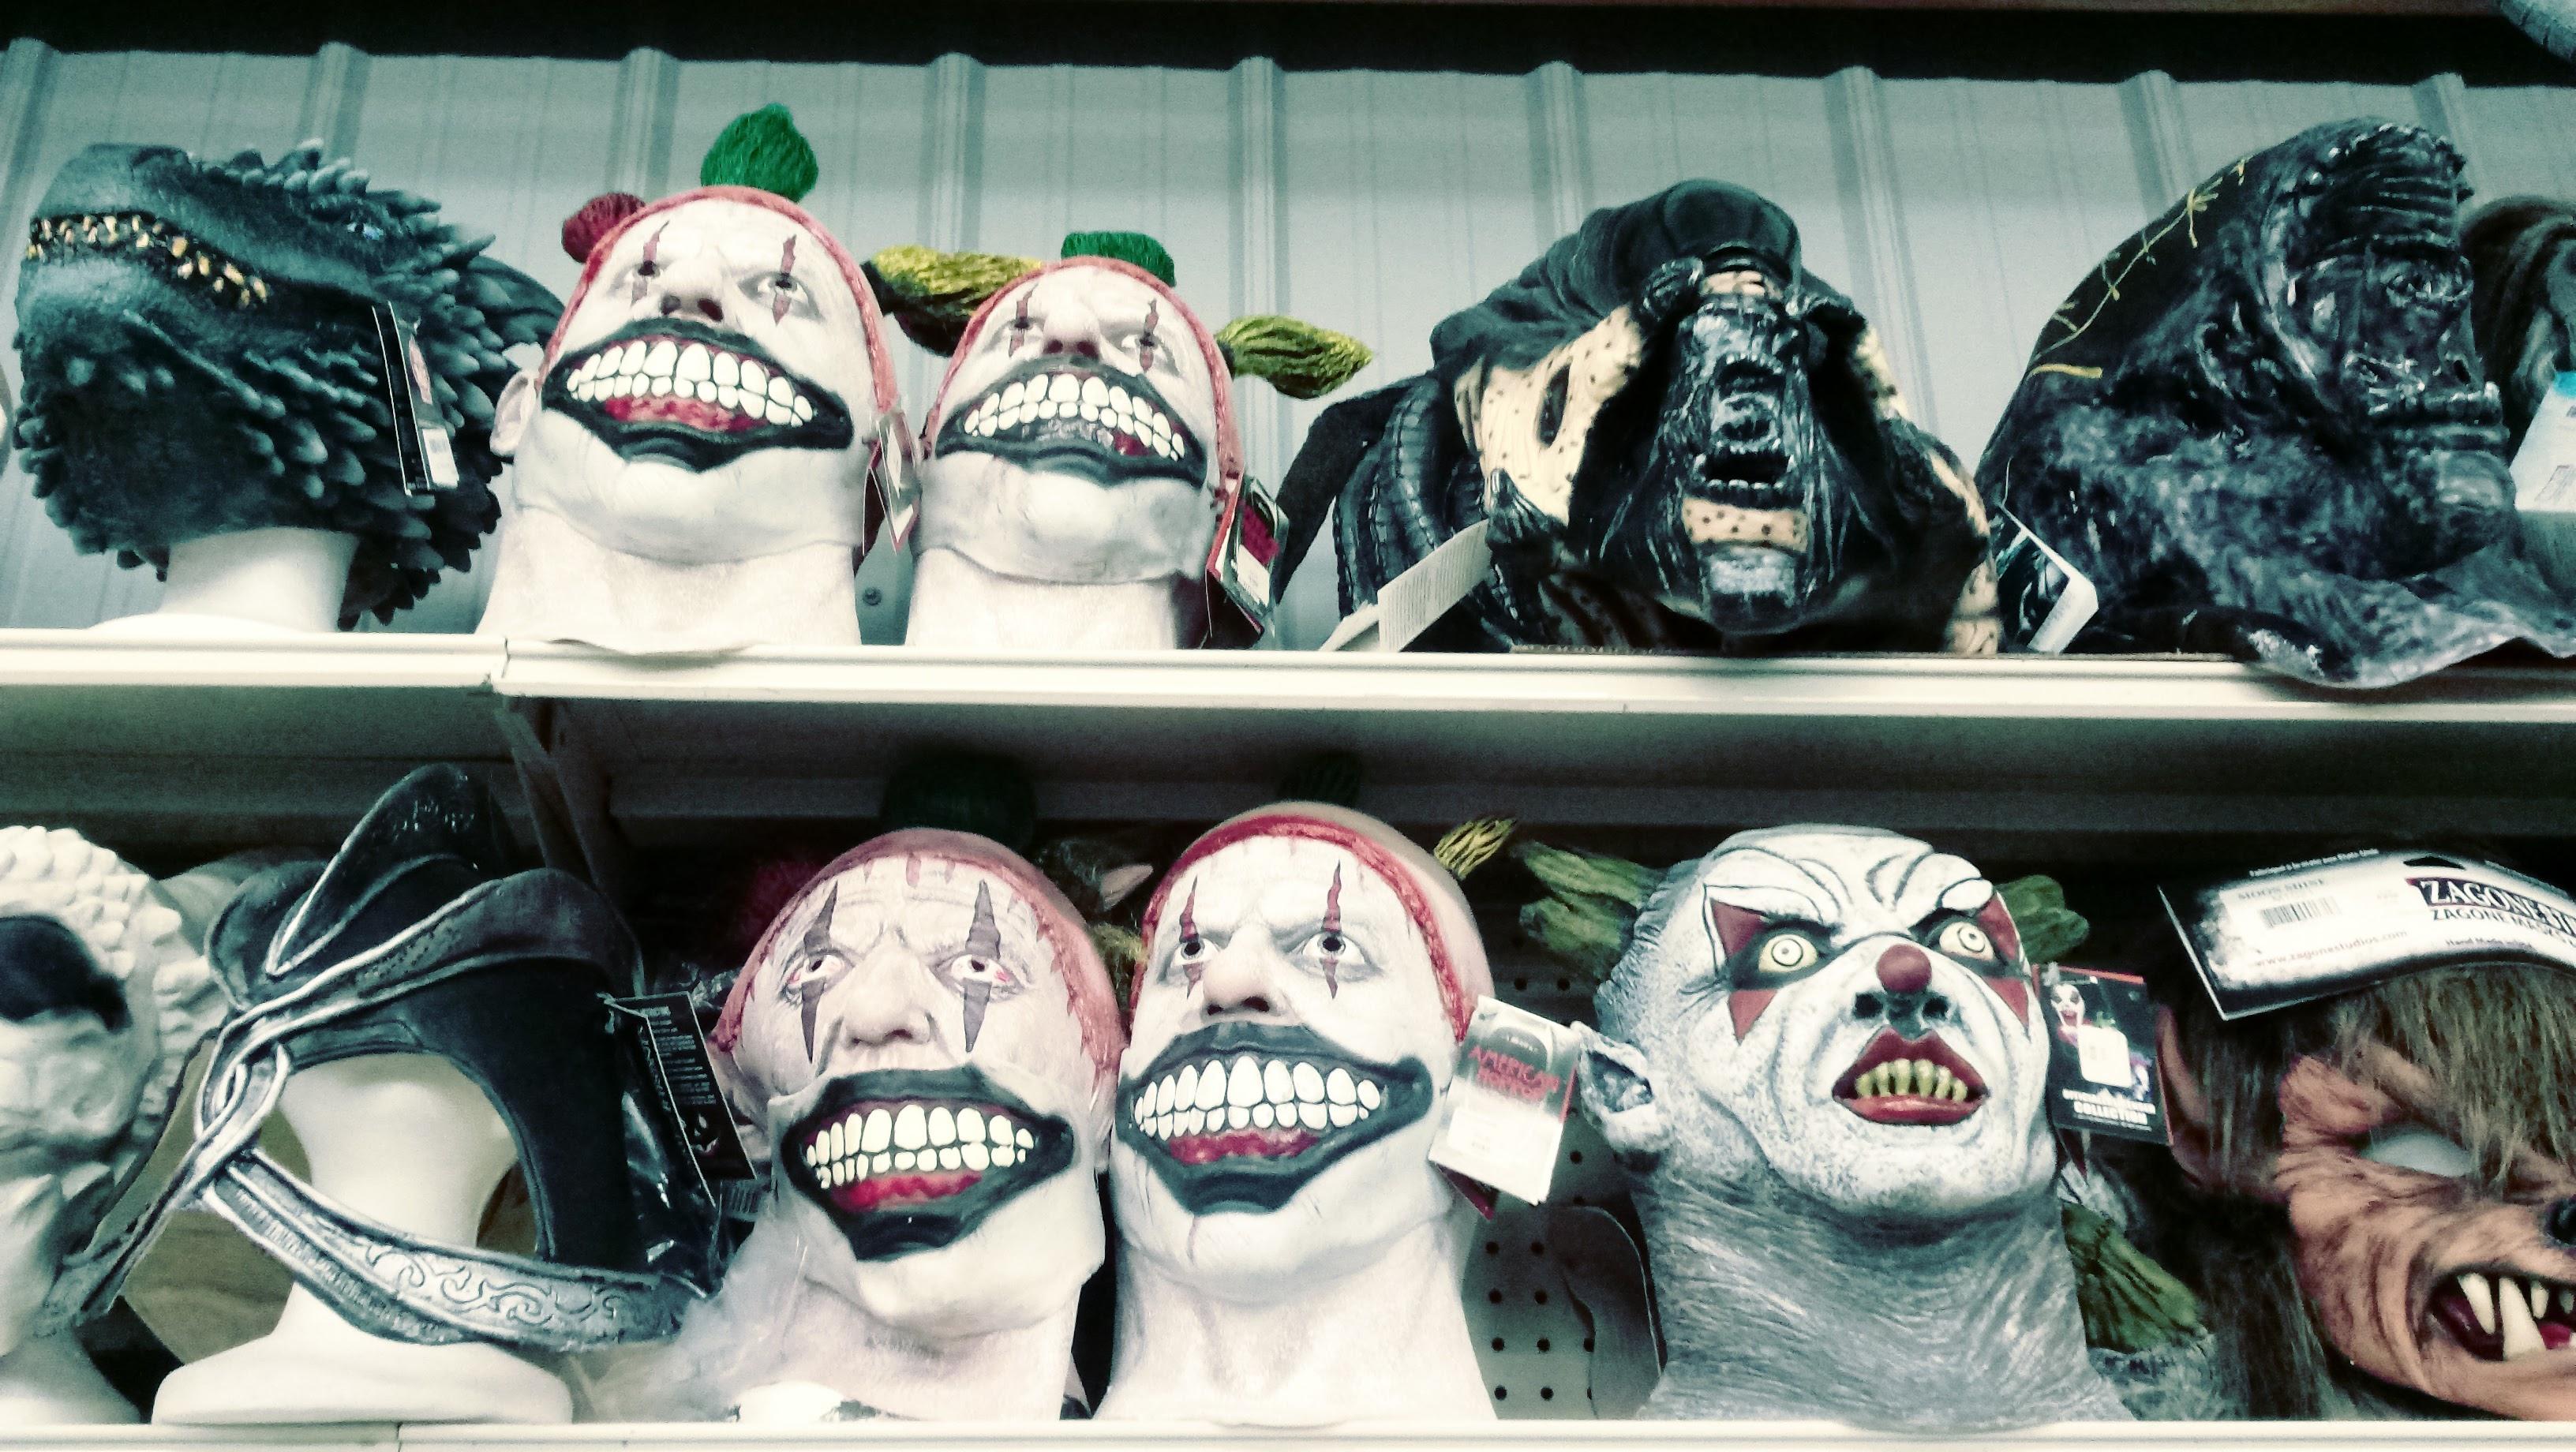 nick nackery alien evil clown werewolf scary monster dragon masks